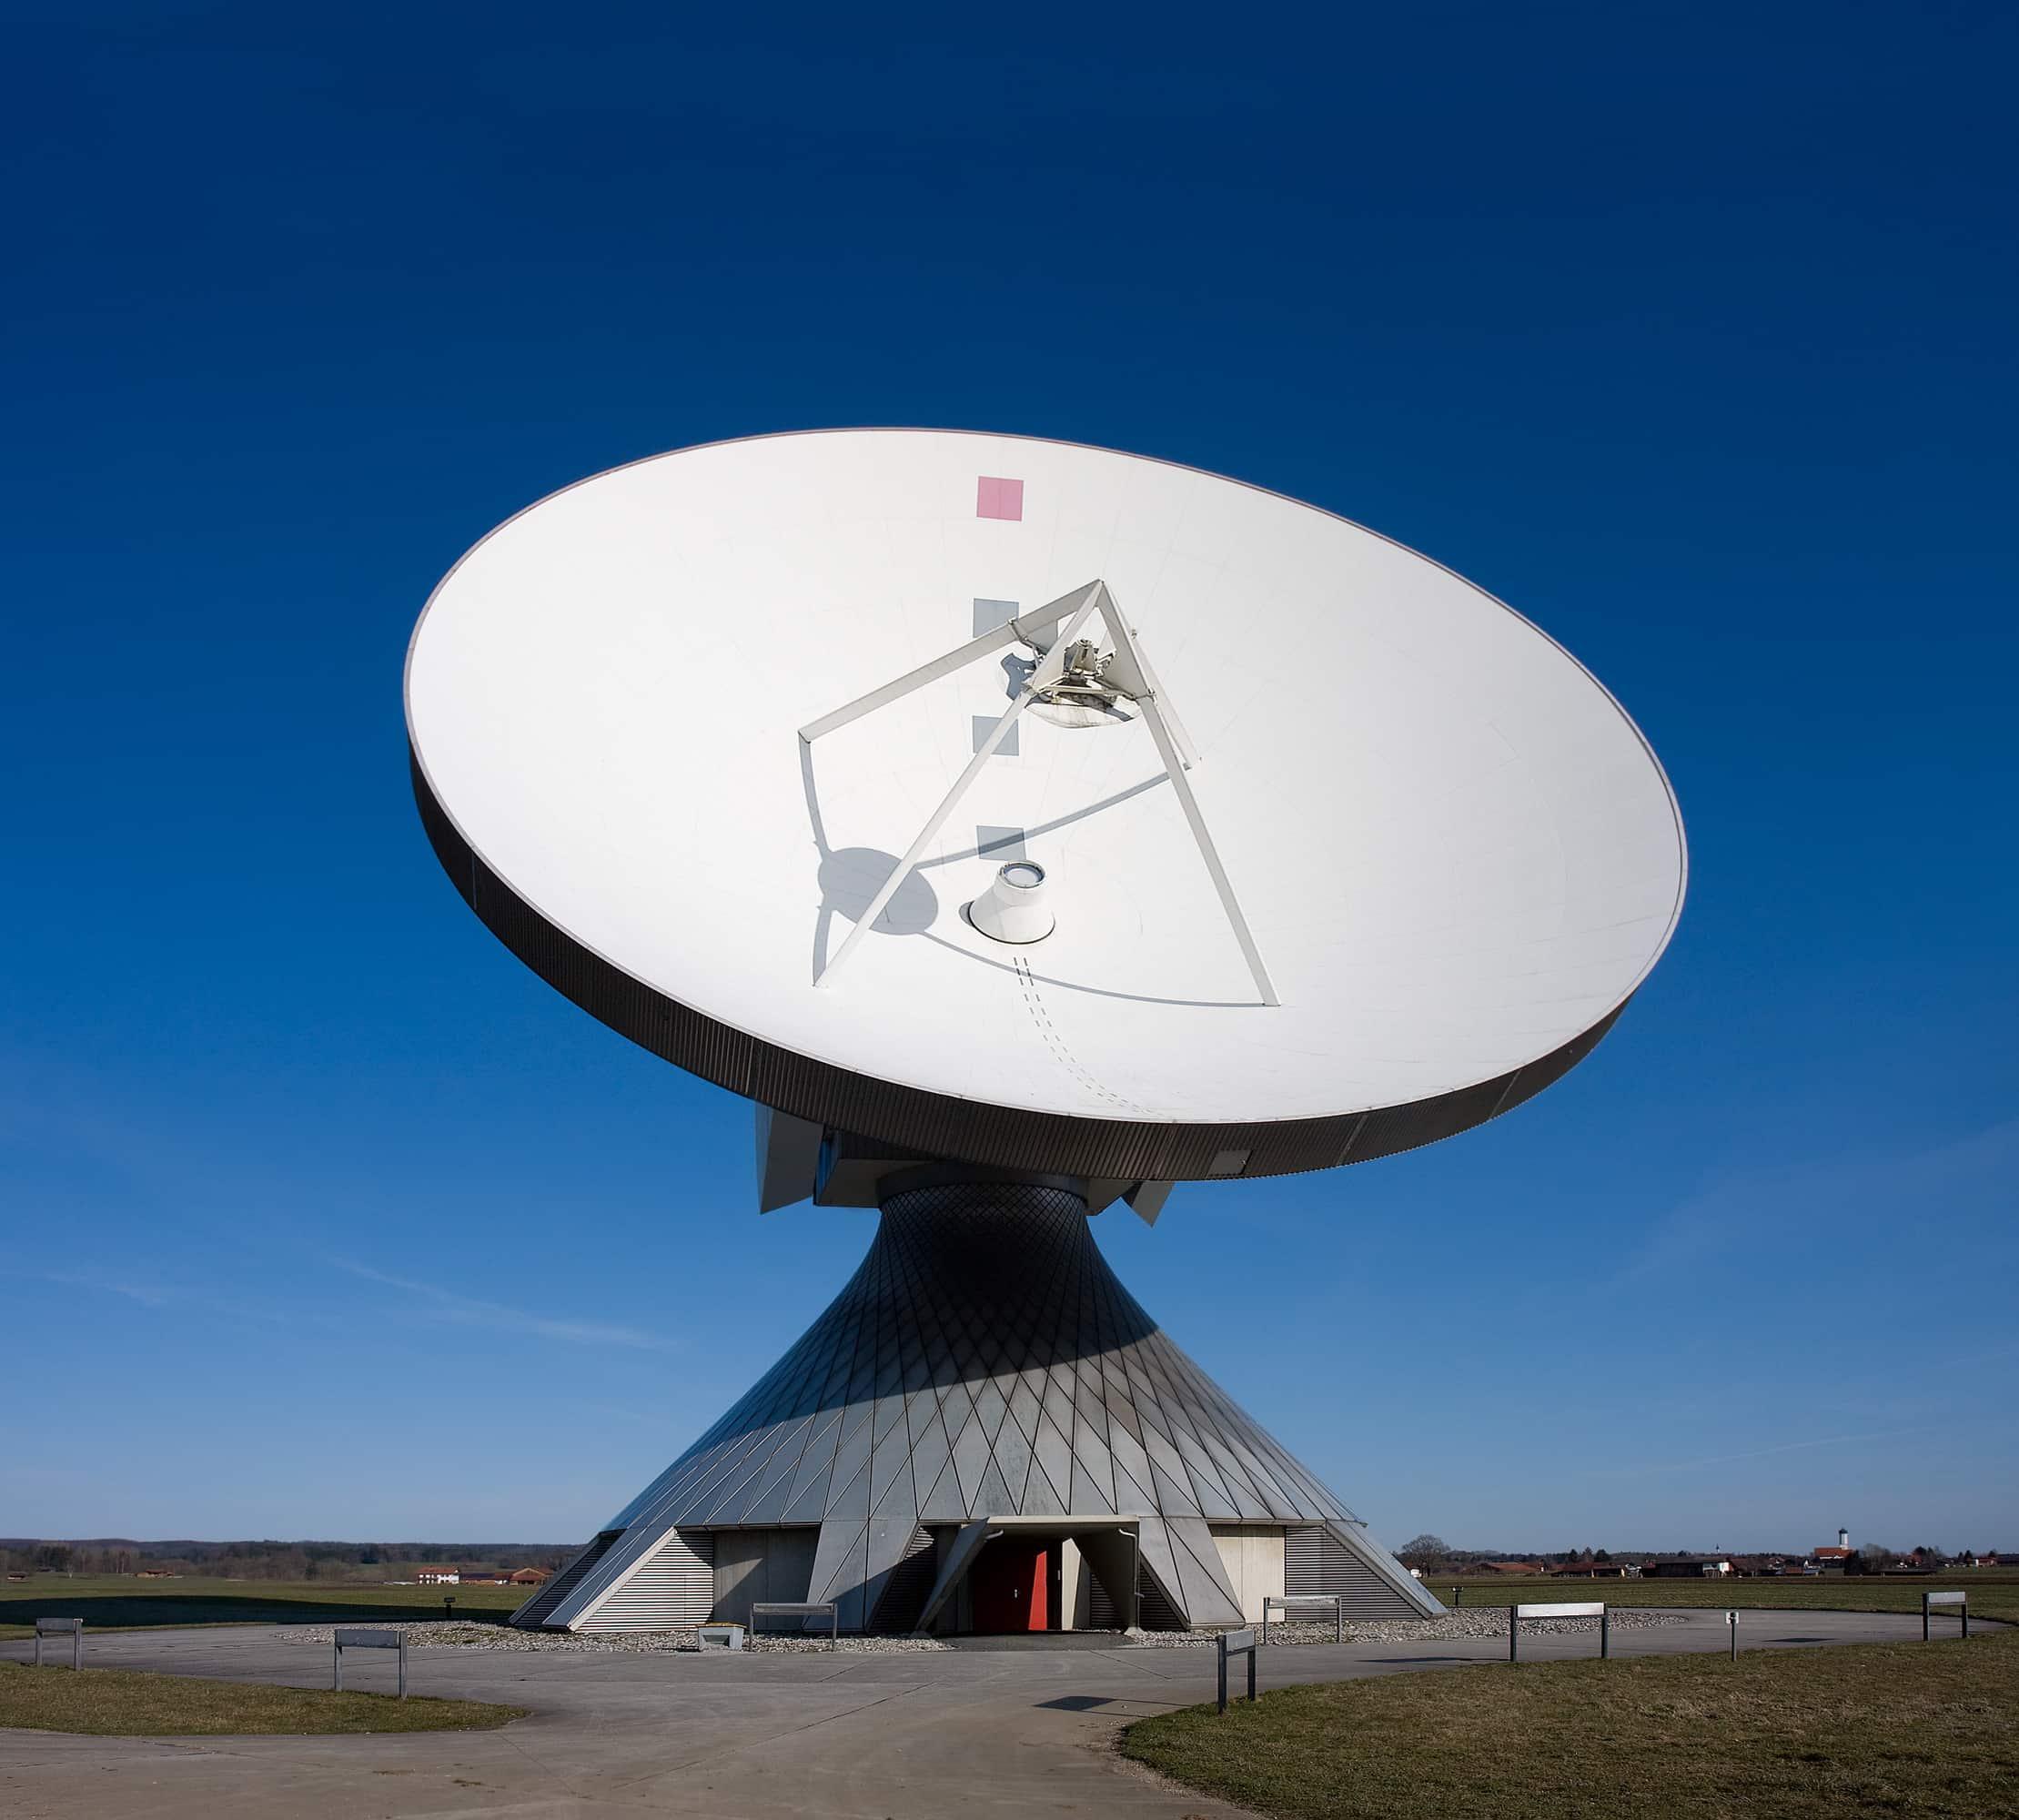 POSTAL AND TELECOMMUNICATIONS CODE